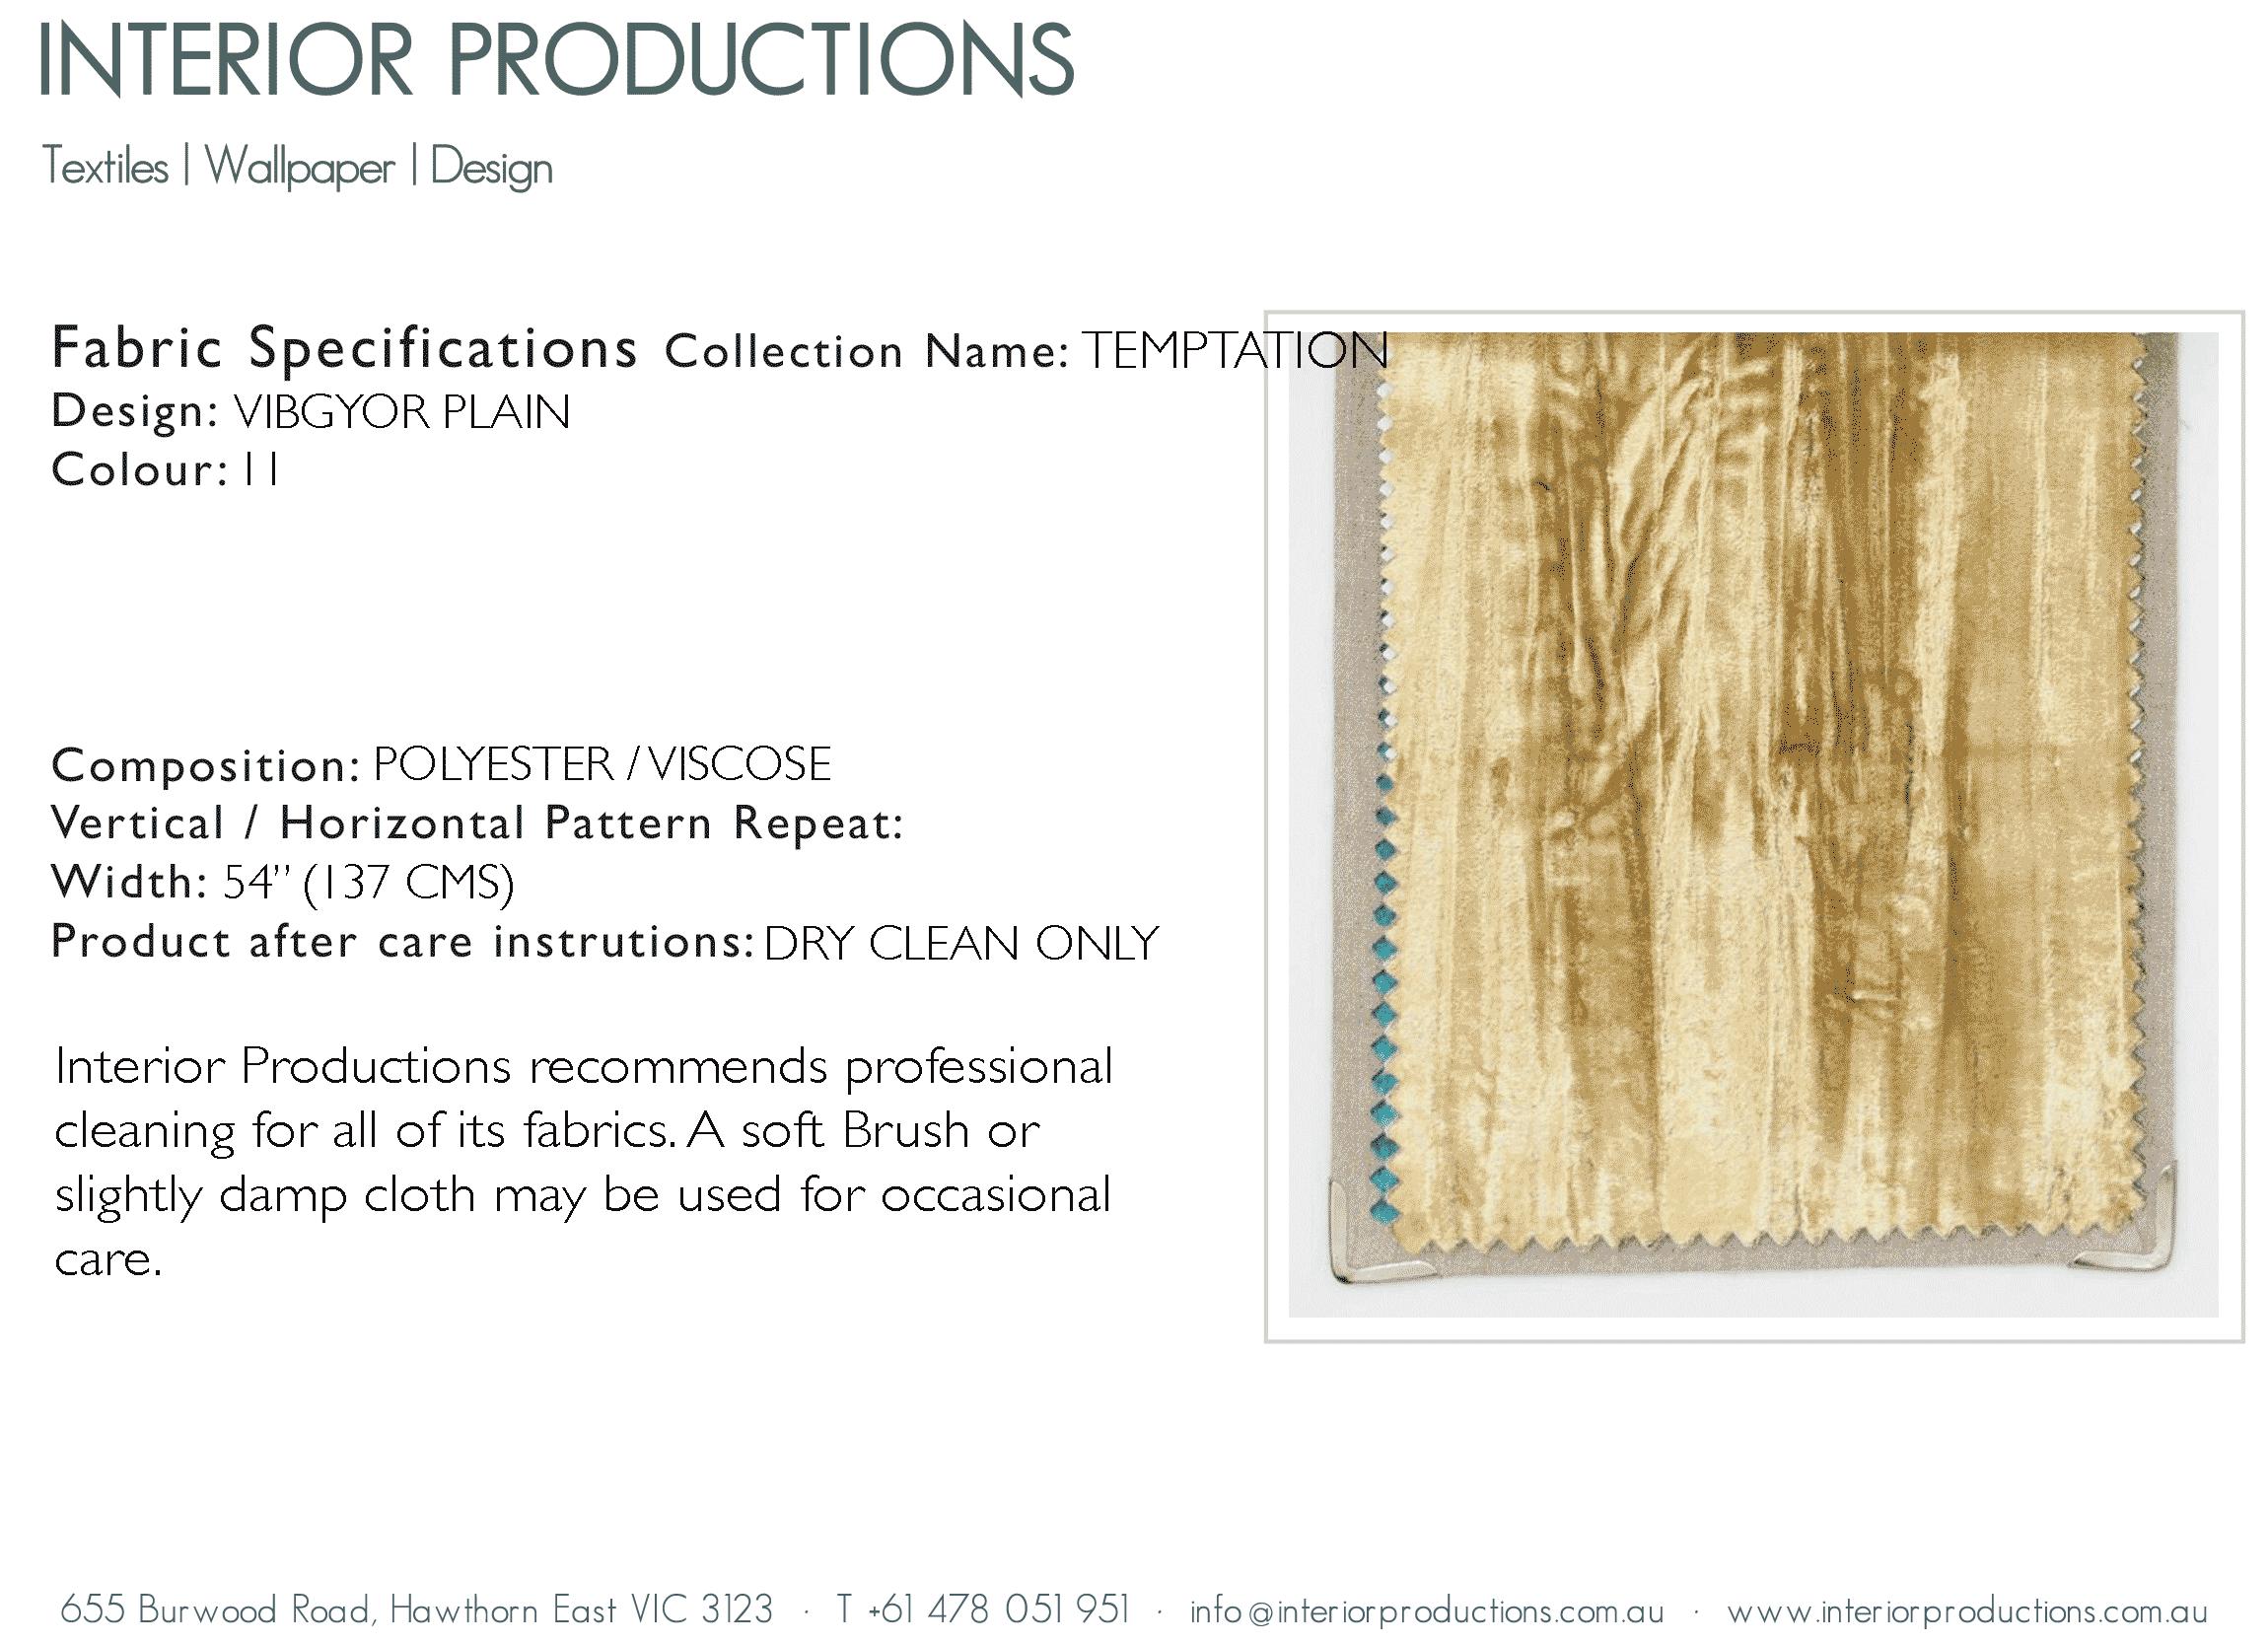 interior_productions_VIBGYOR-PLAIN---11